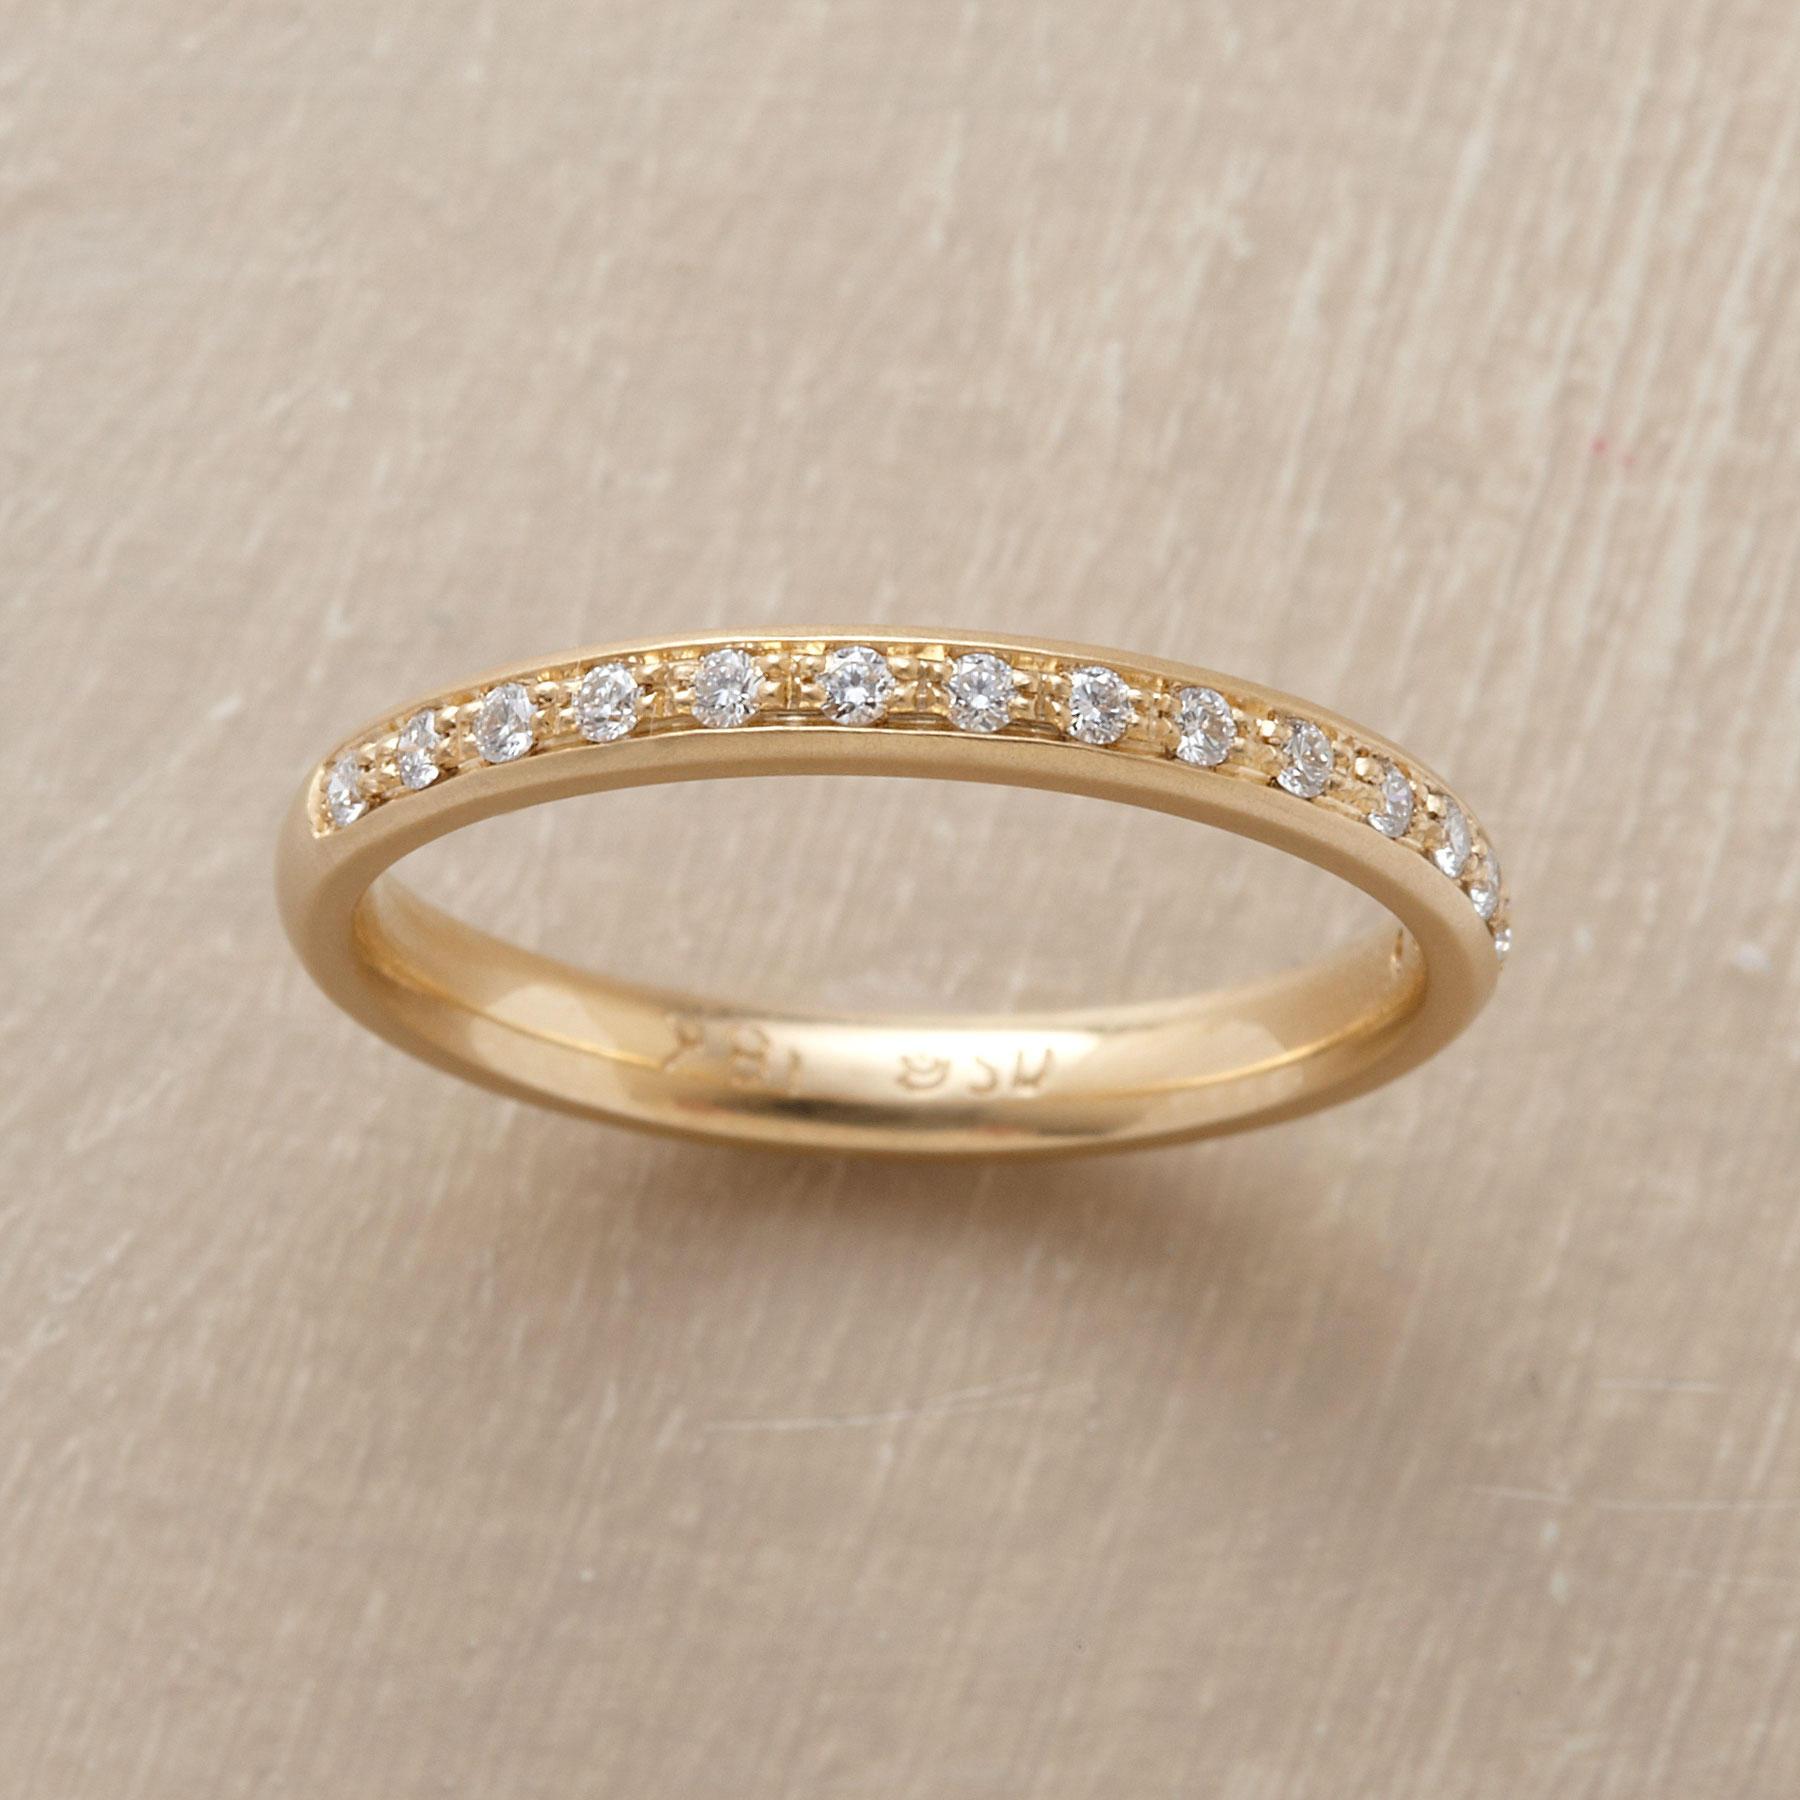 Single Row Yellow Gold Pave Diamond Ring